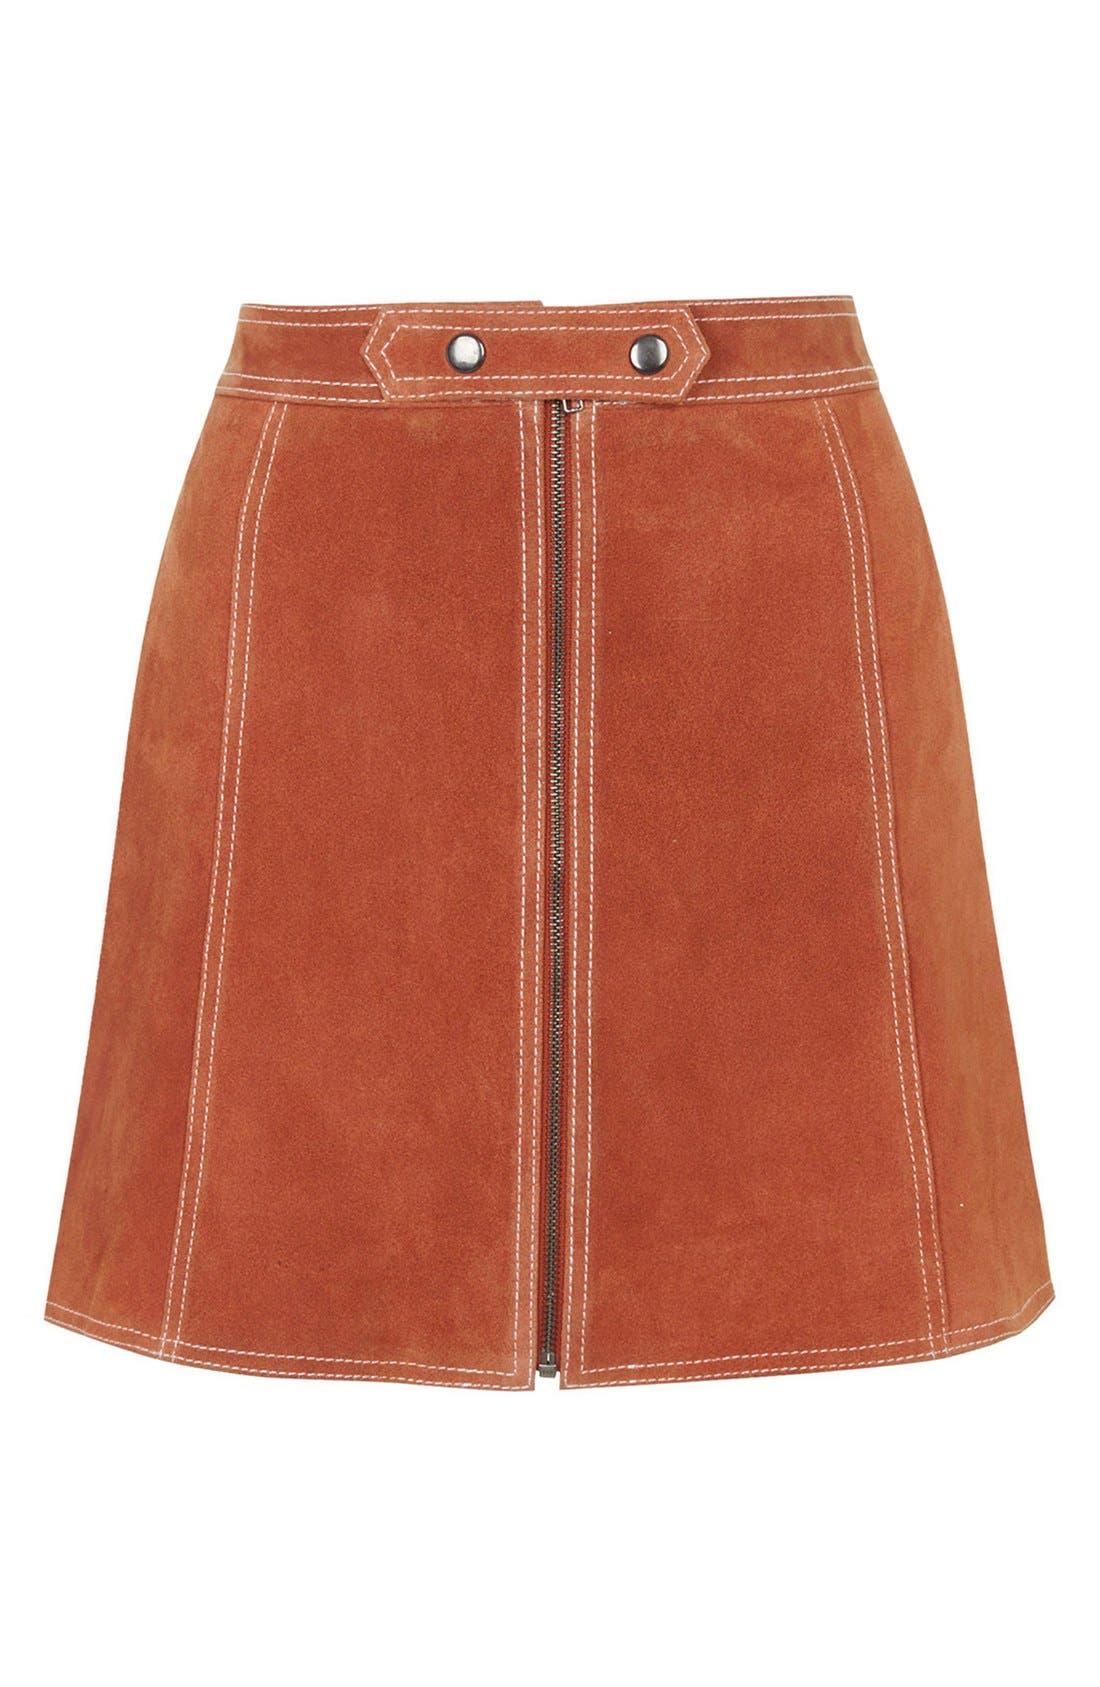 Suede A-Line Miniskirt,                             Alternate thumbnail 5, color,                             610